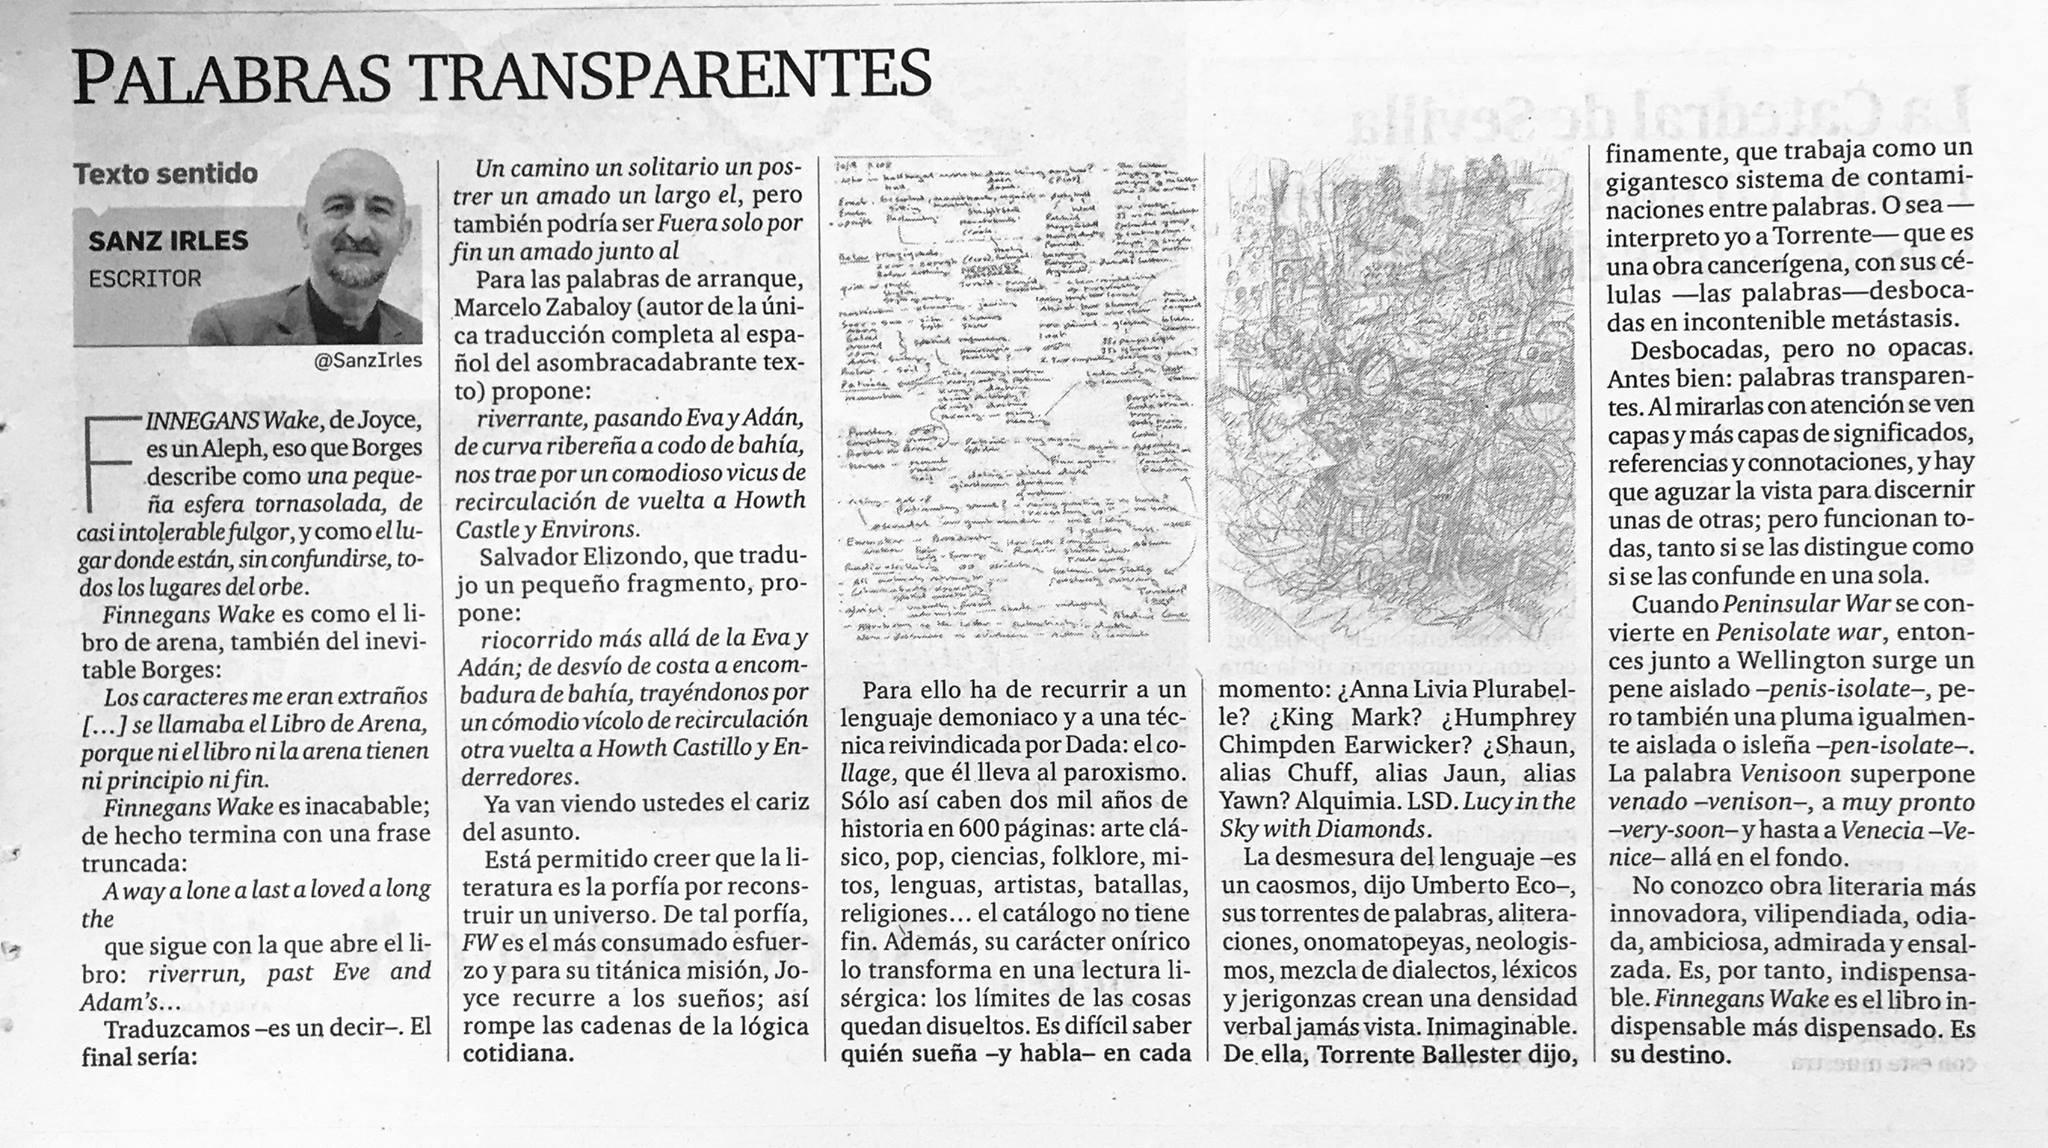 2017_12_08_Palabras transparentes